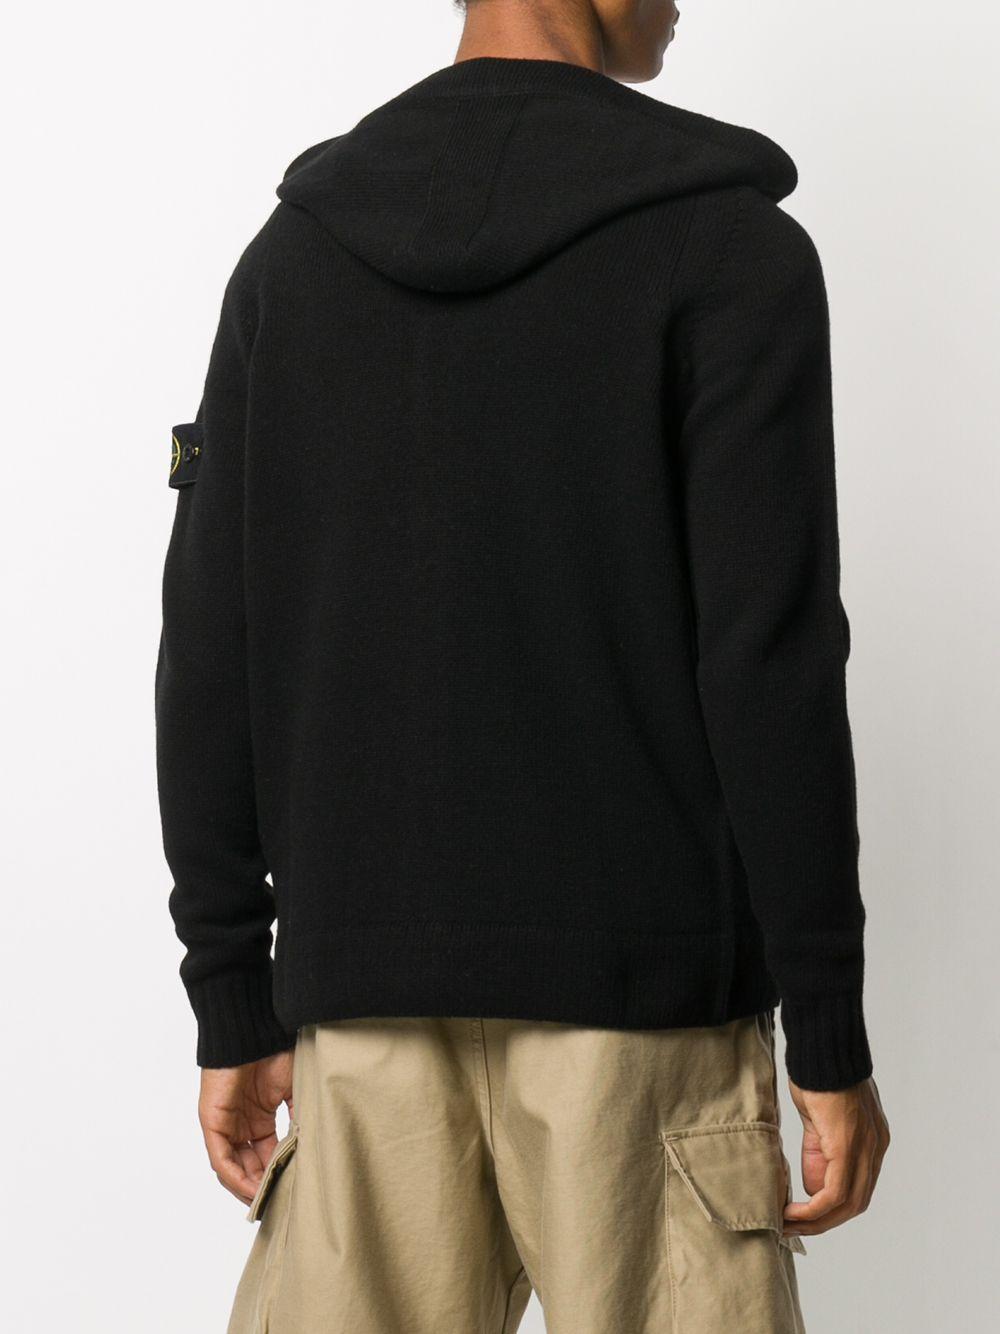 Black wool-blend hooded cardigan STONE ISLAND |  | 7315506A3V0029